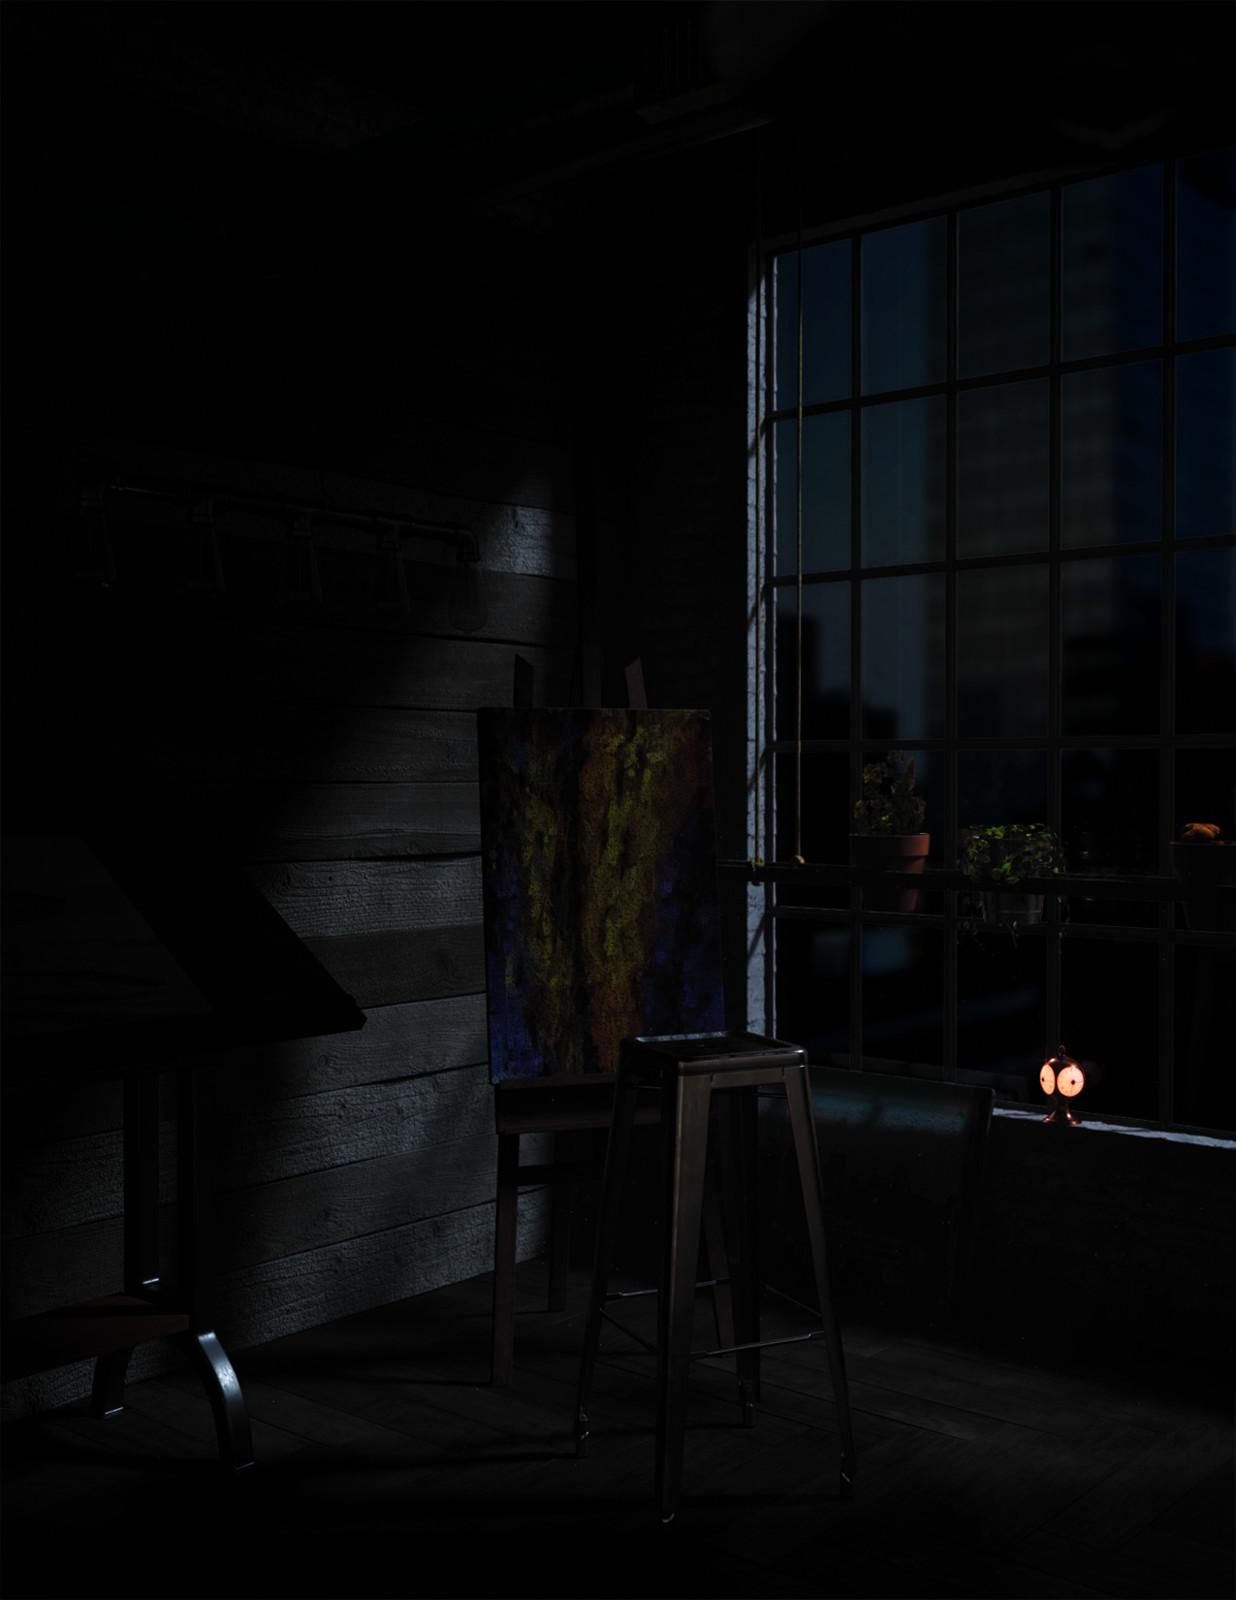 LightMix - Midnight/ Bright moon